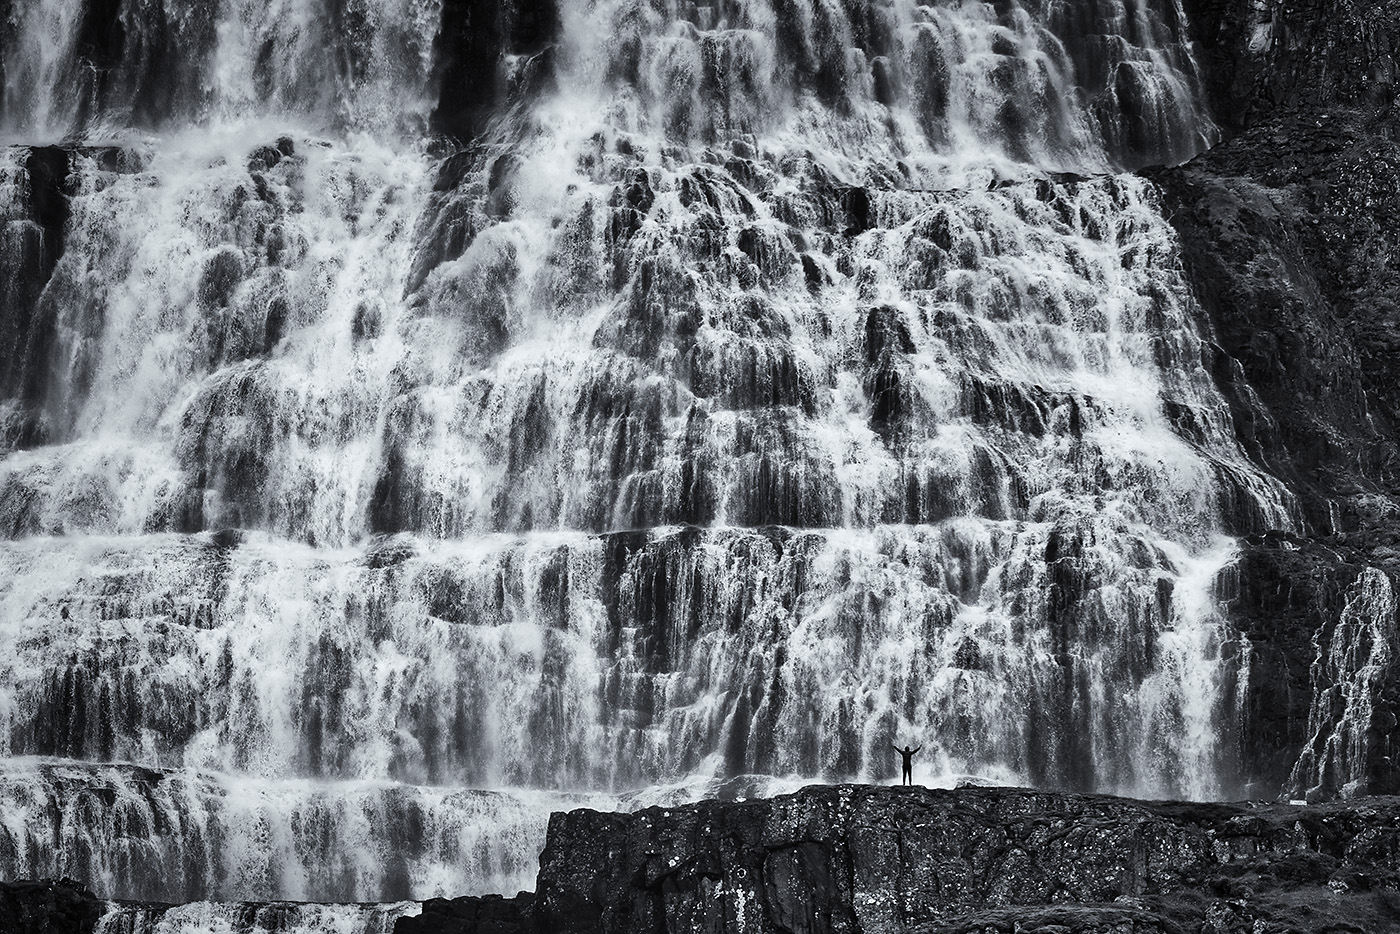 Marco Schweier: Fallendes Wasser